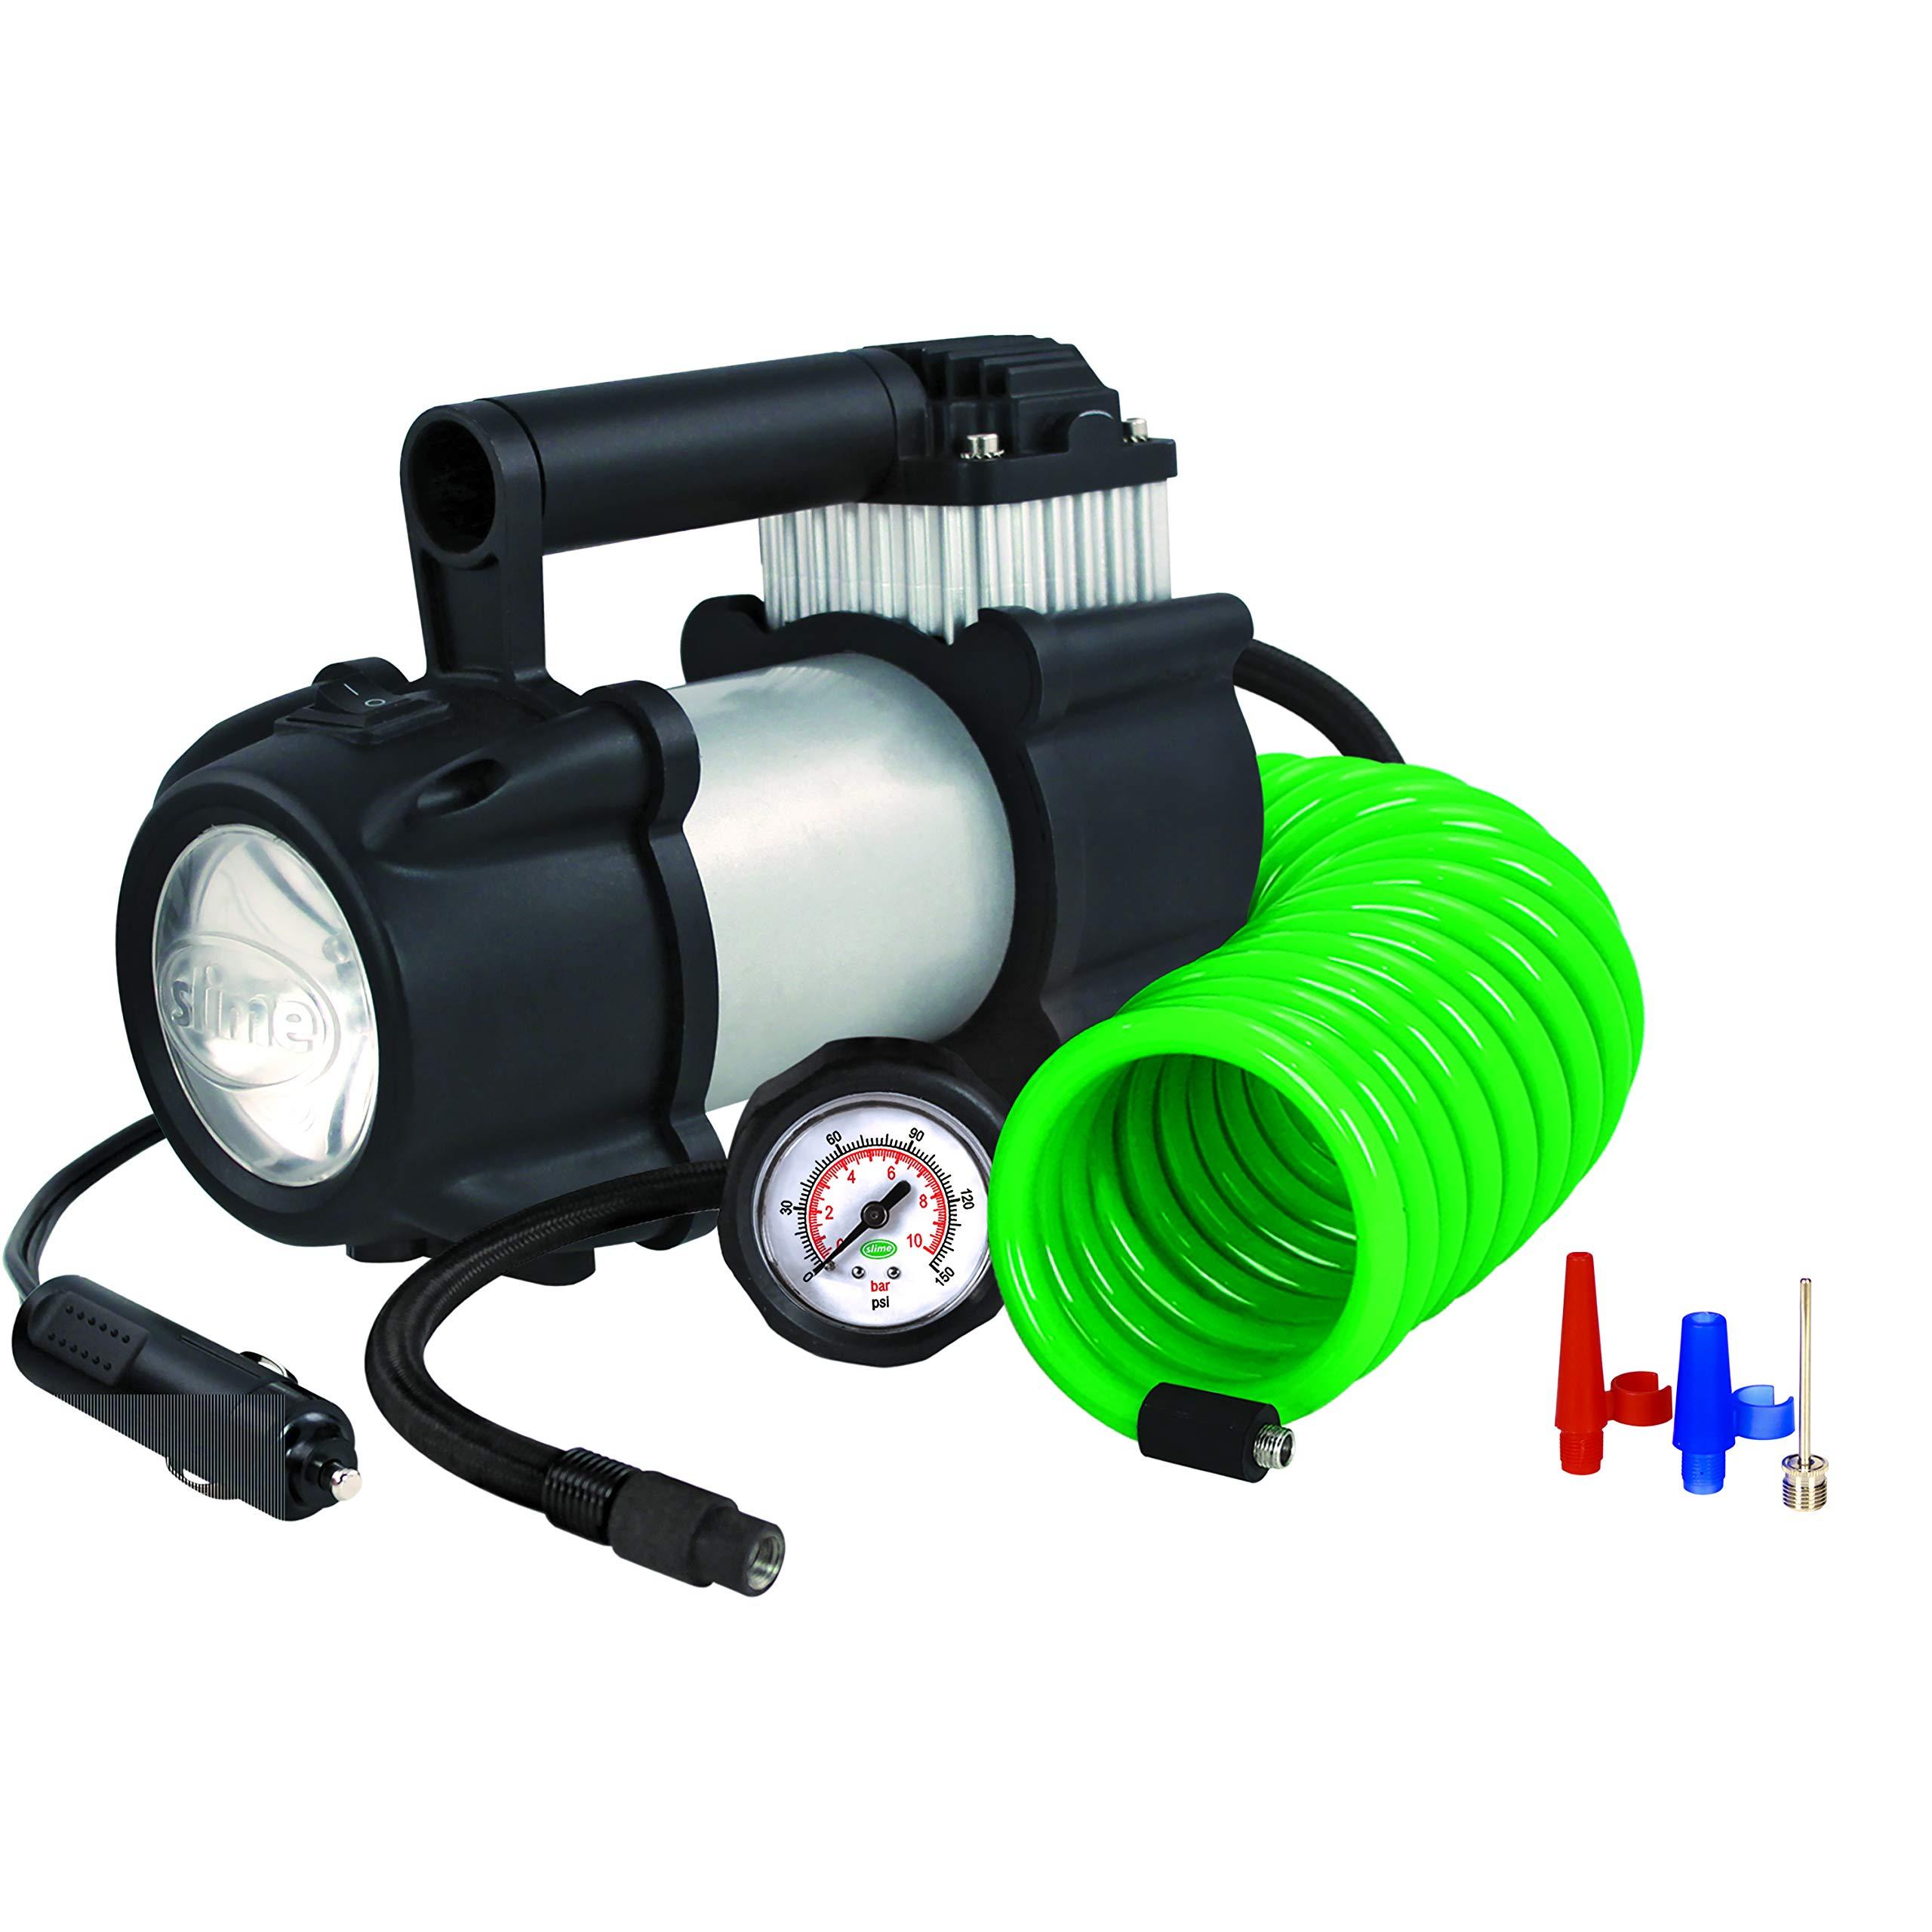 Slime 40031 Power Heavy Inflator